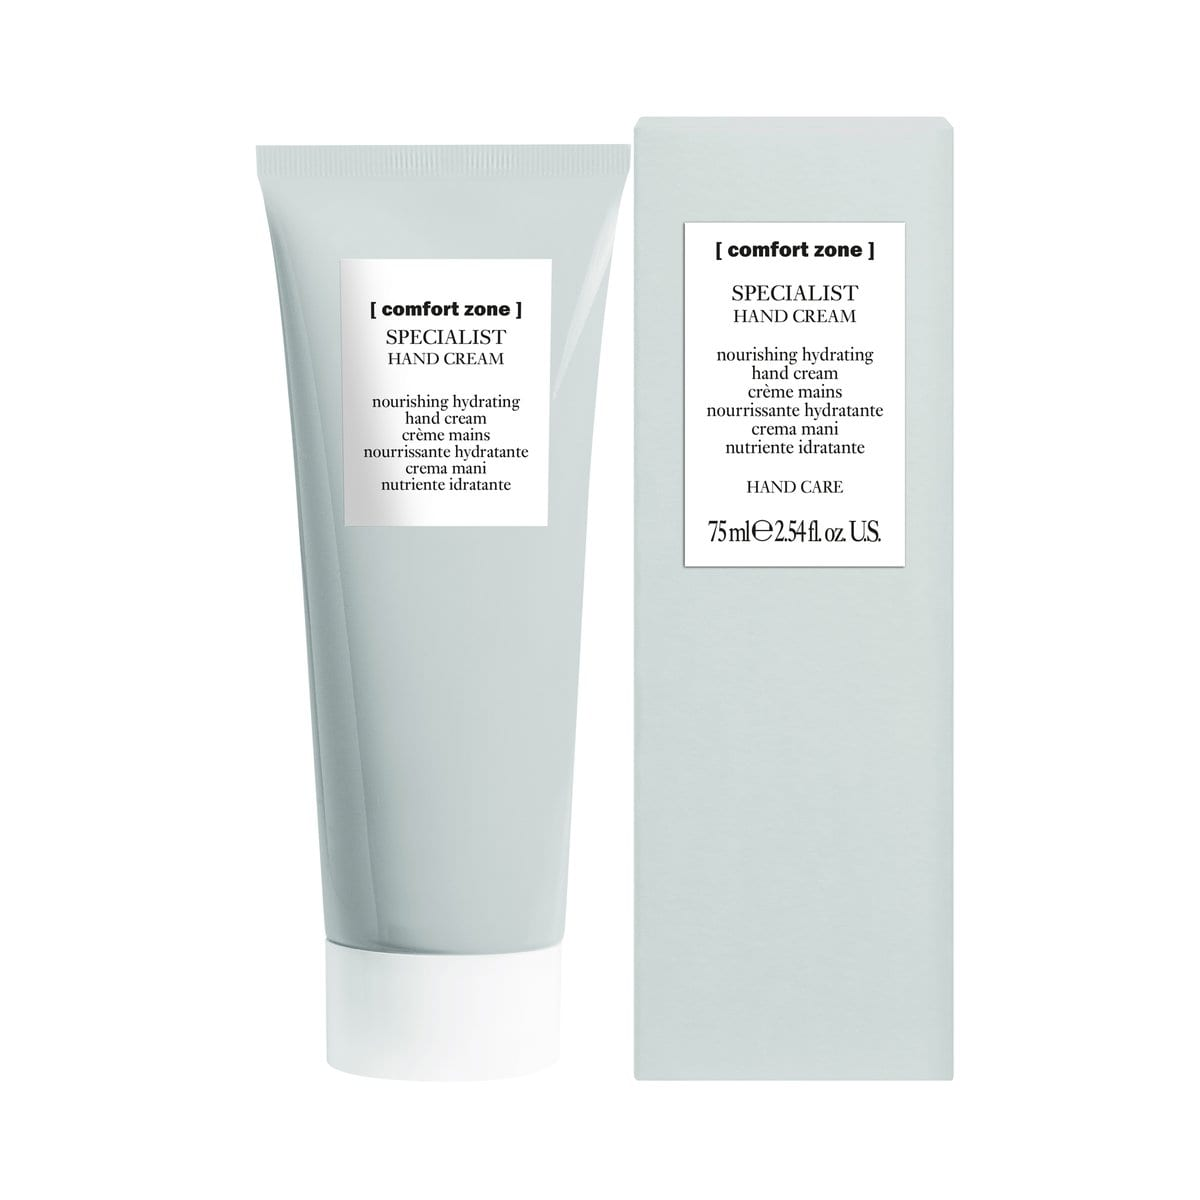 SPECIALIST Hand Cream -0